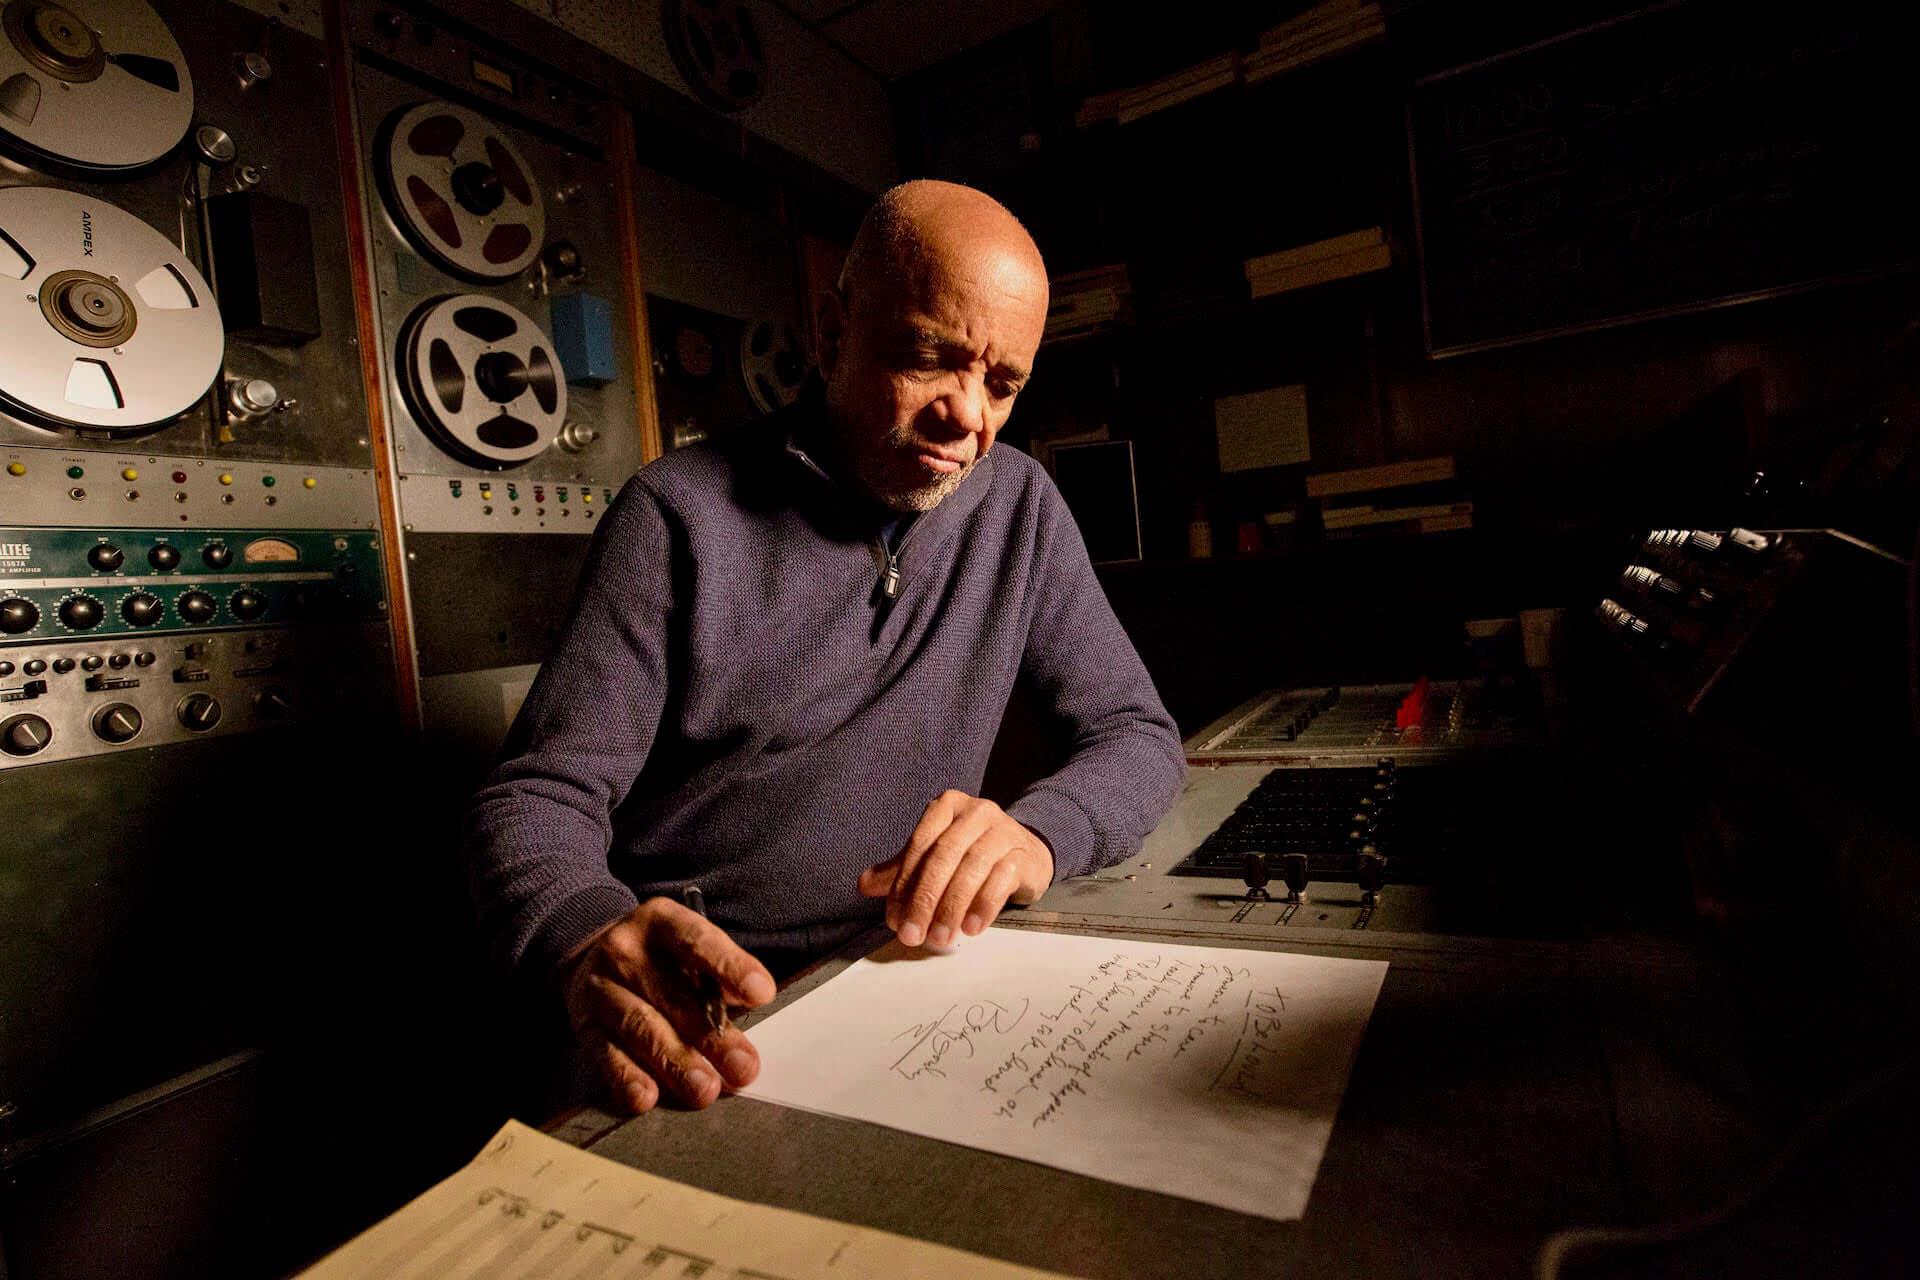 Marvin GayeやStevie Wonderを輩出した〈モータウン〉の軌跡がドキュメンタリー映画に!『メイキング・オブ・モータウン』が日本公開決定 film200625_makingofmotown_2-1920x1280